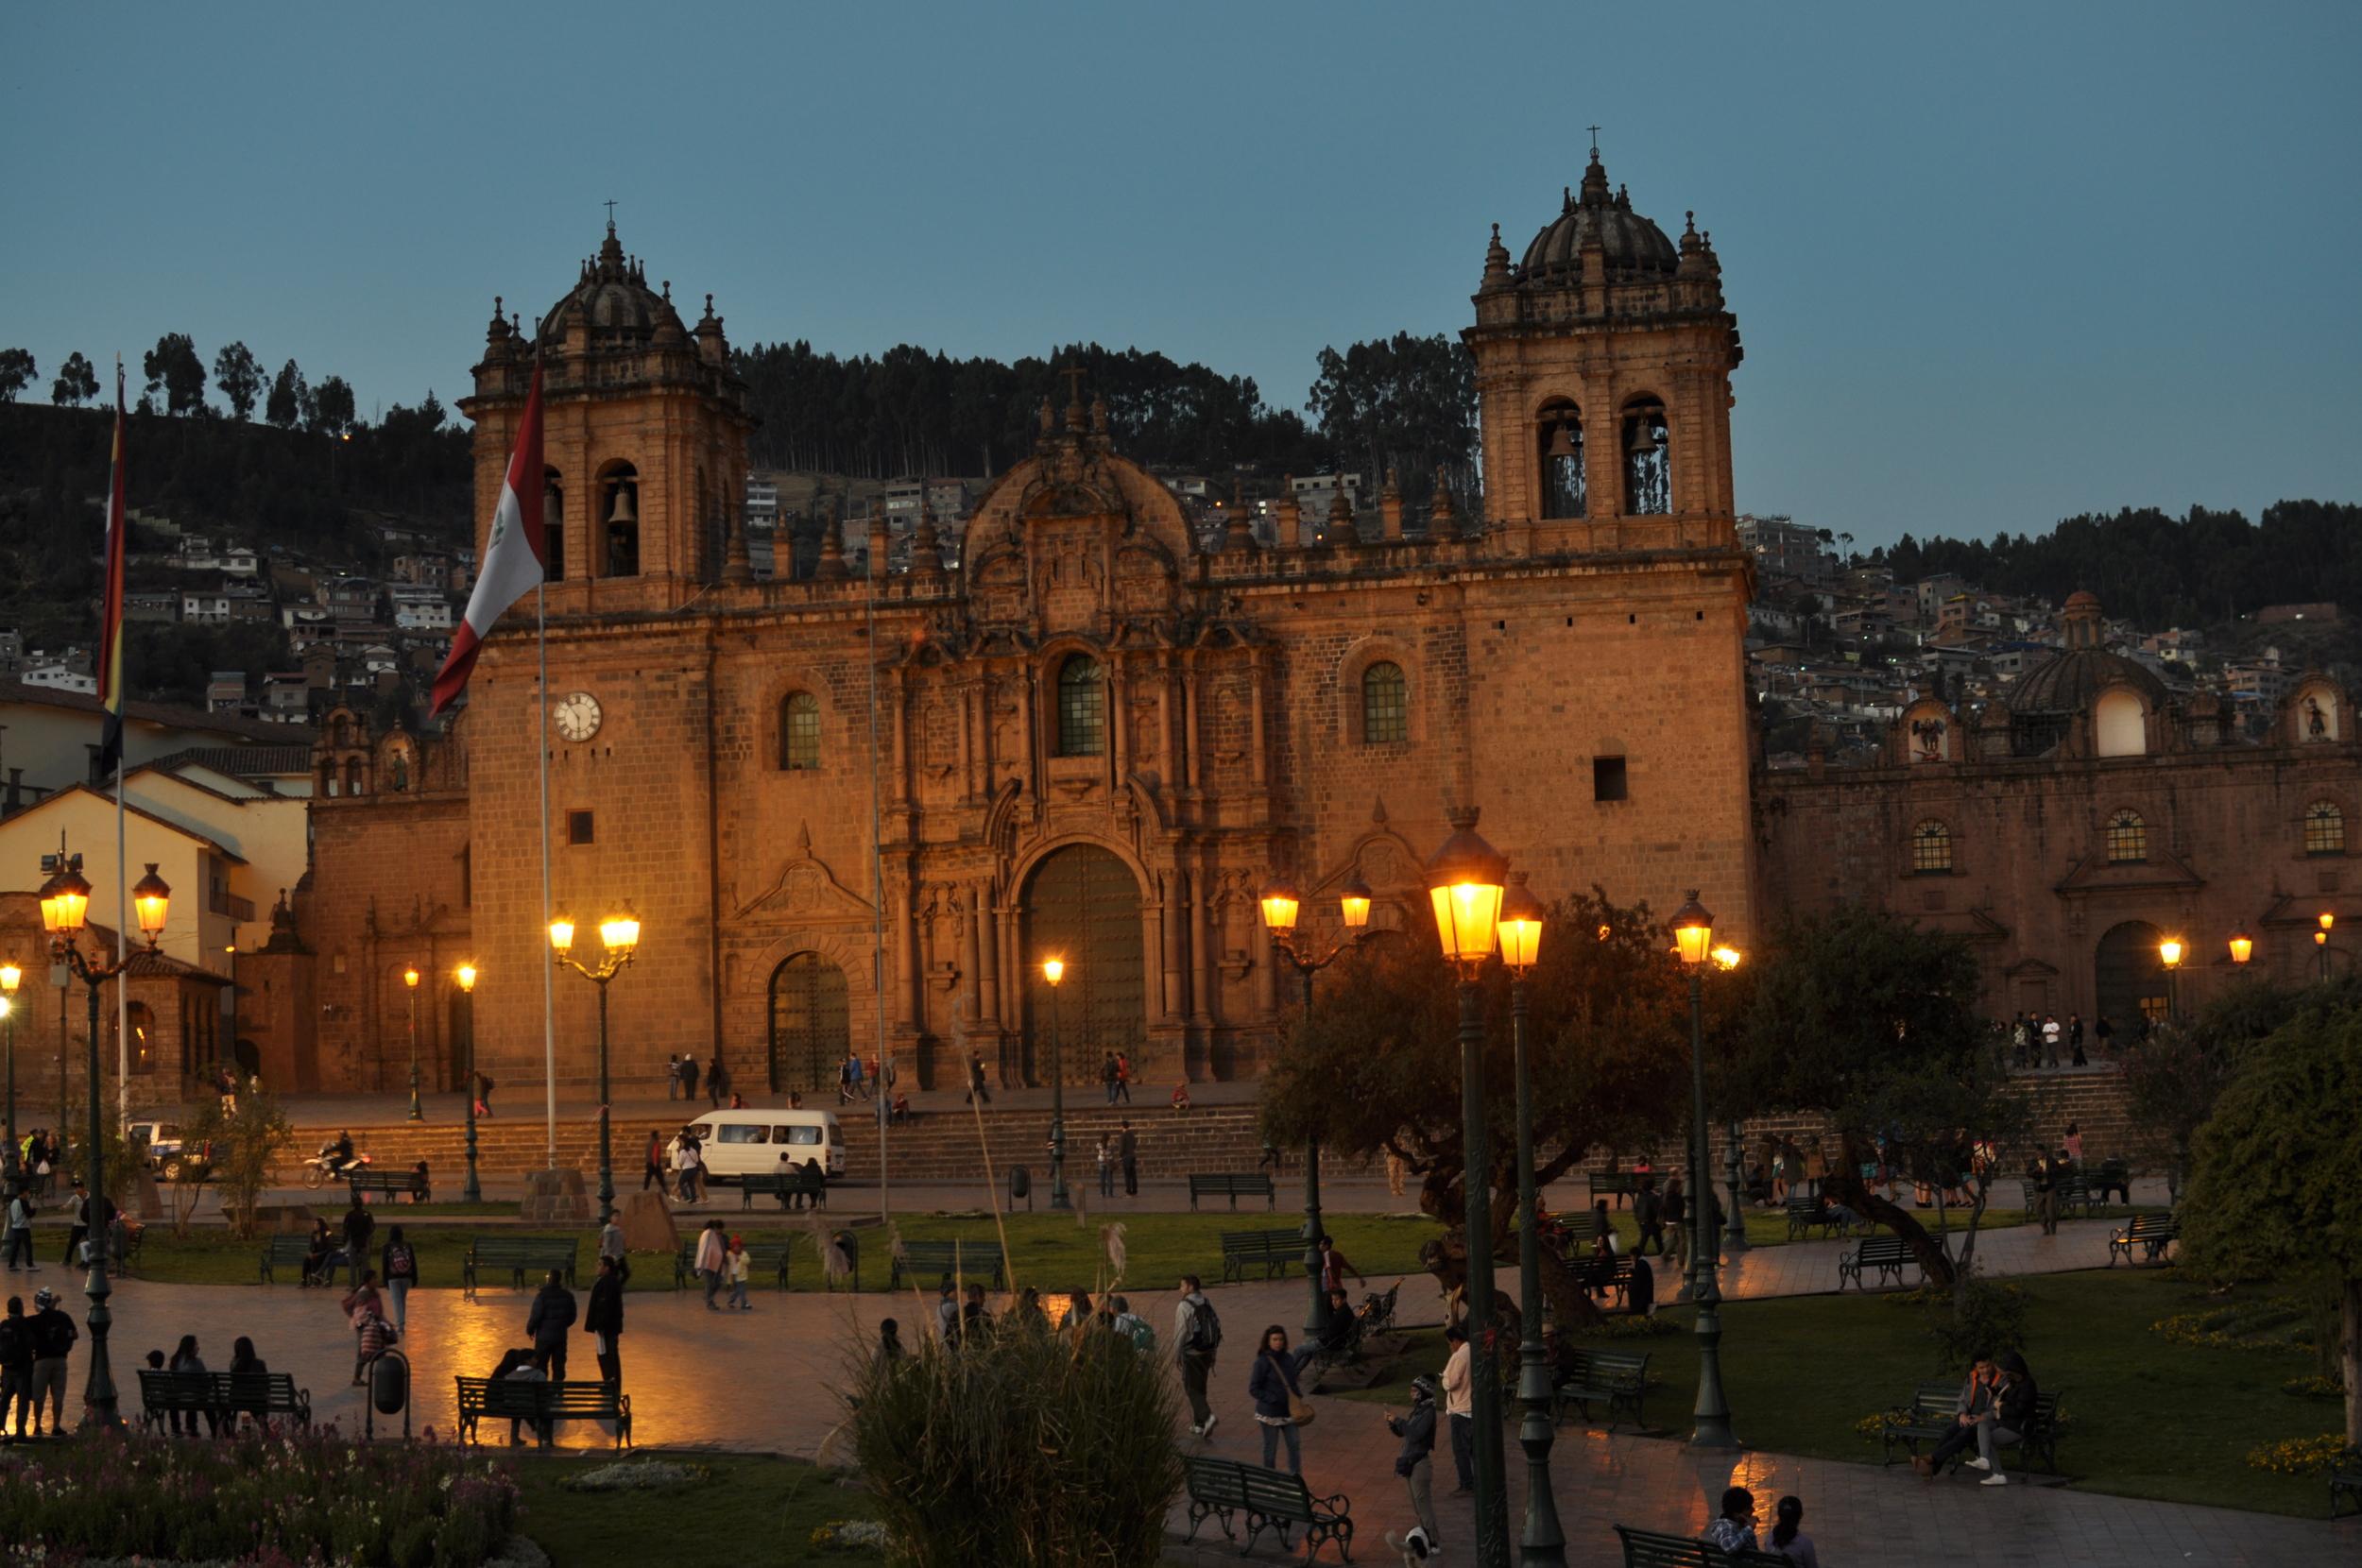 The Plaza De Armas at night